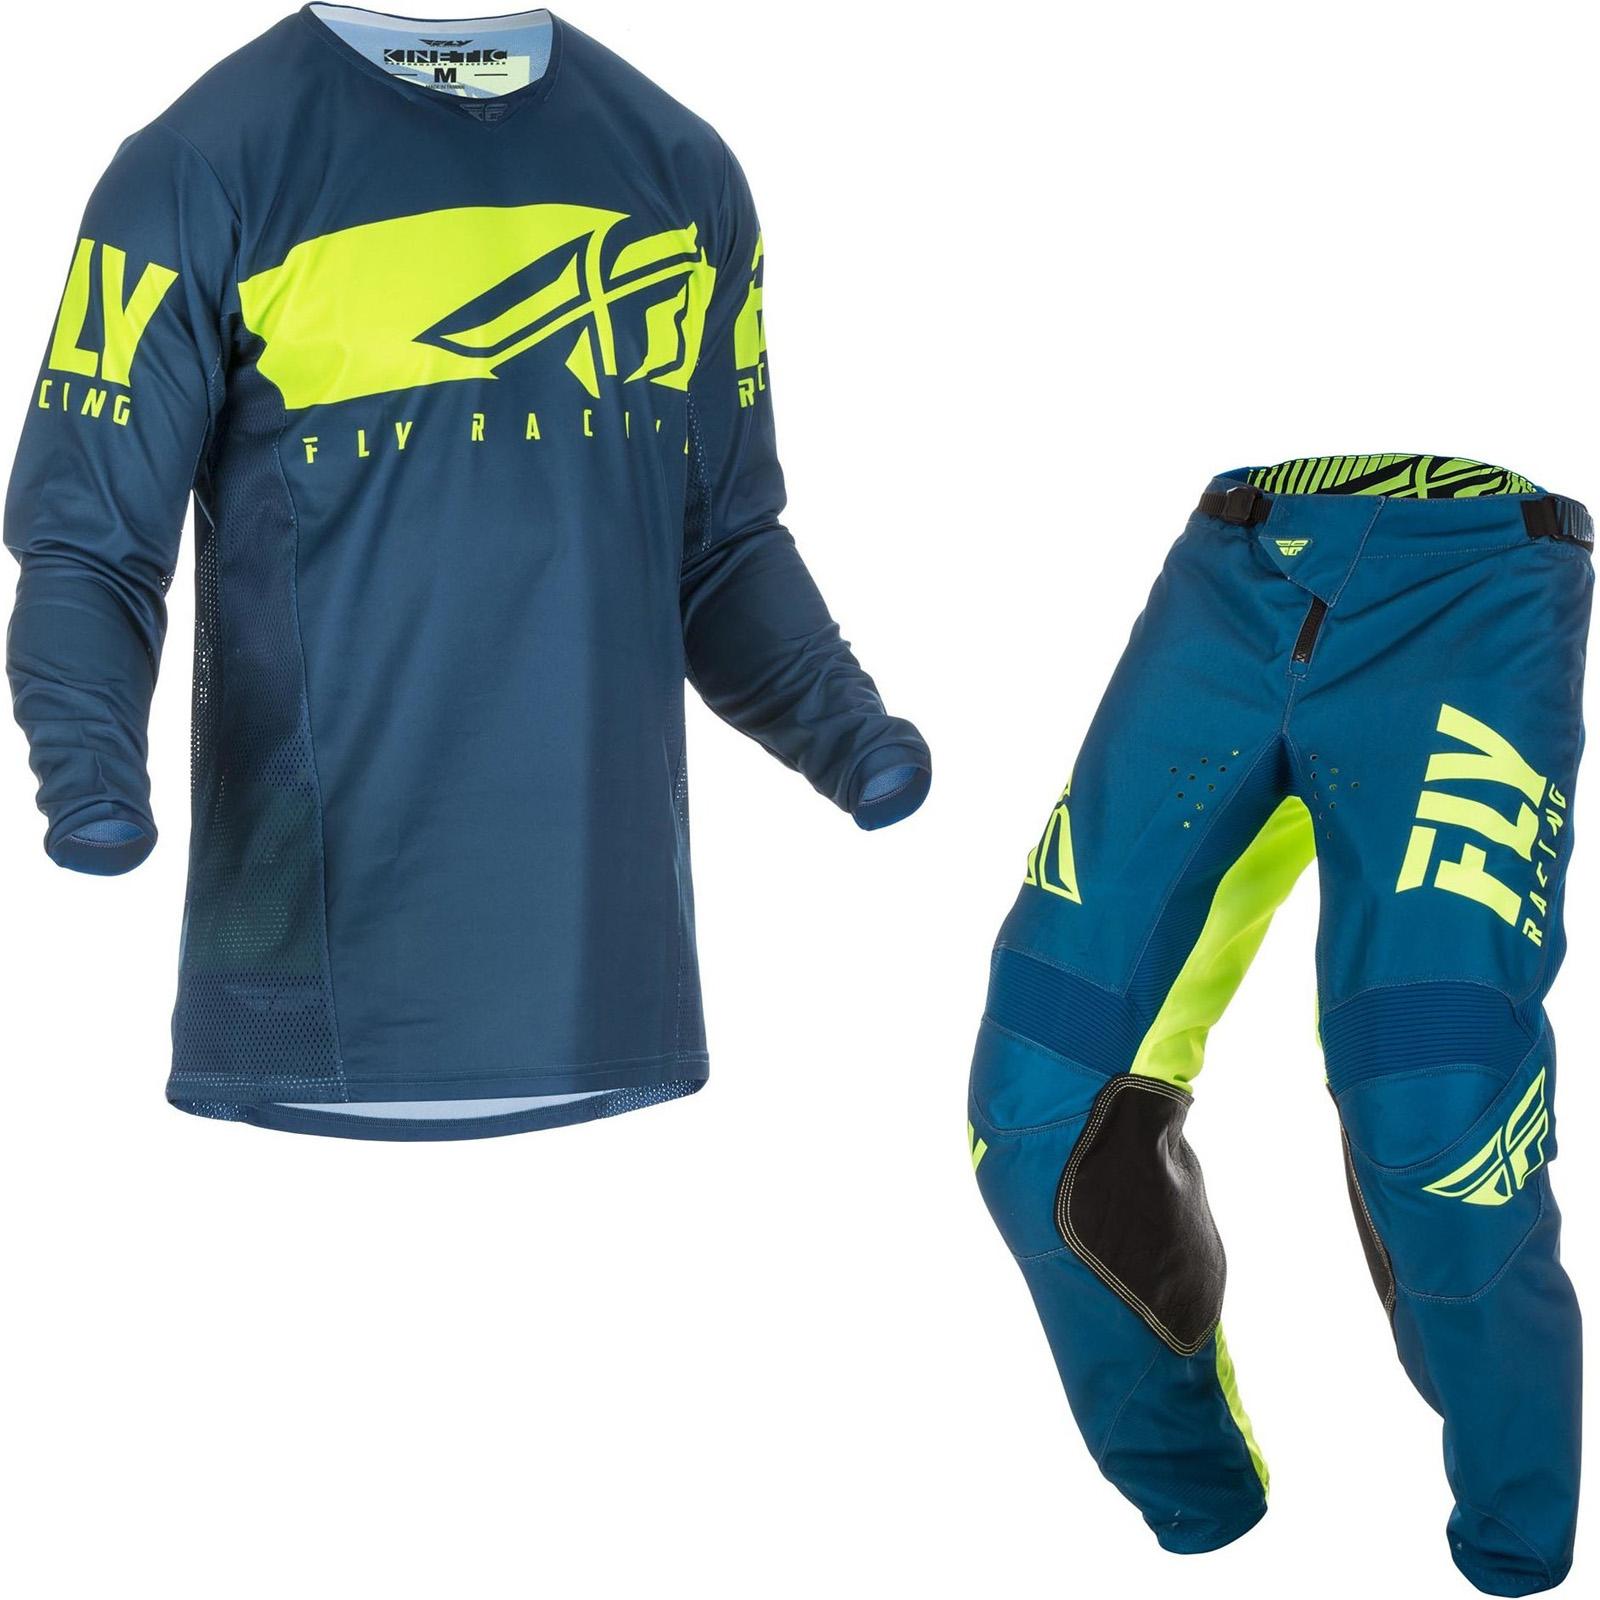 mxgear Fly Racing Youth Boys F-16 Motocross Jersey /& Pants Navy//Blue//White